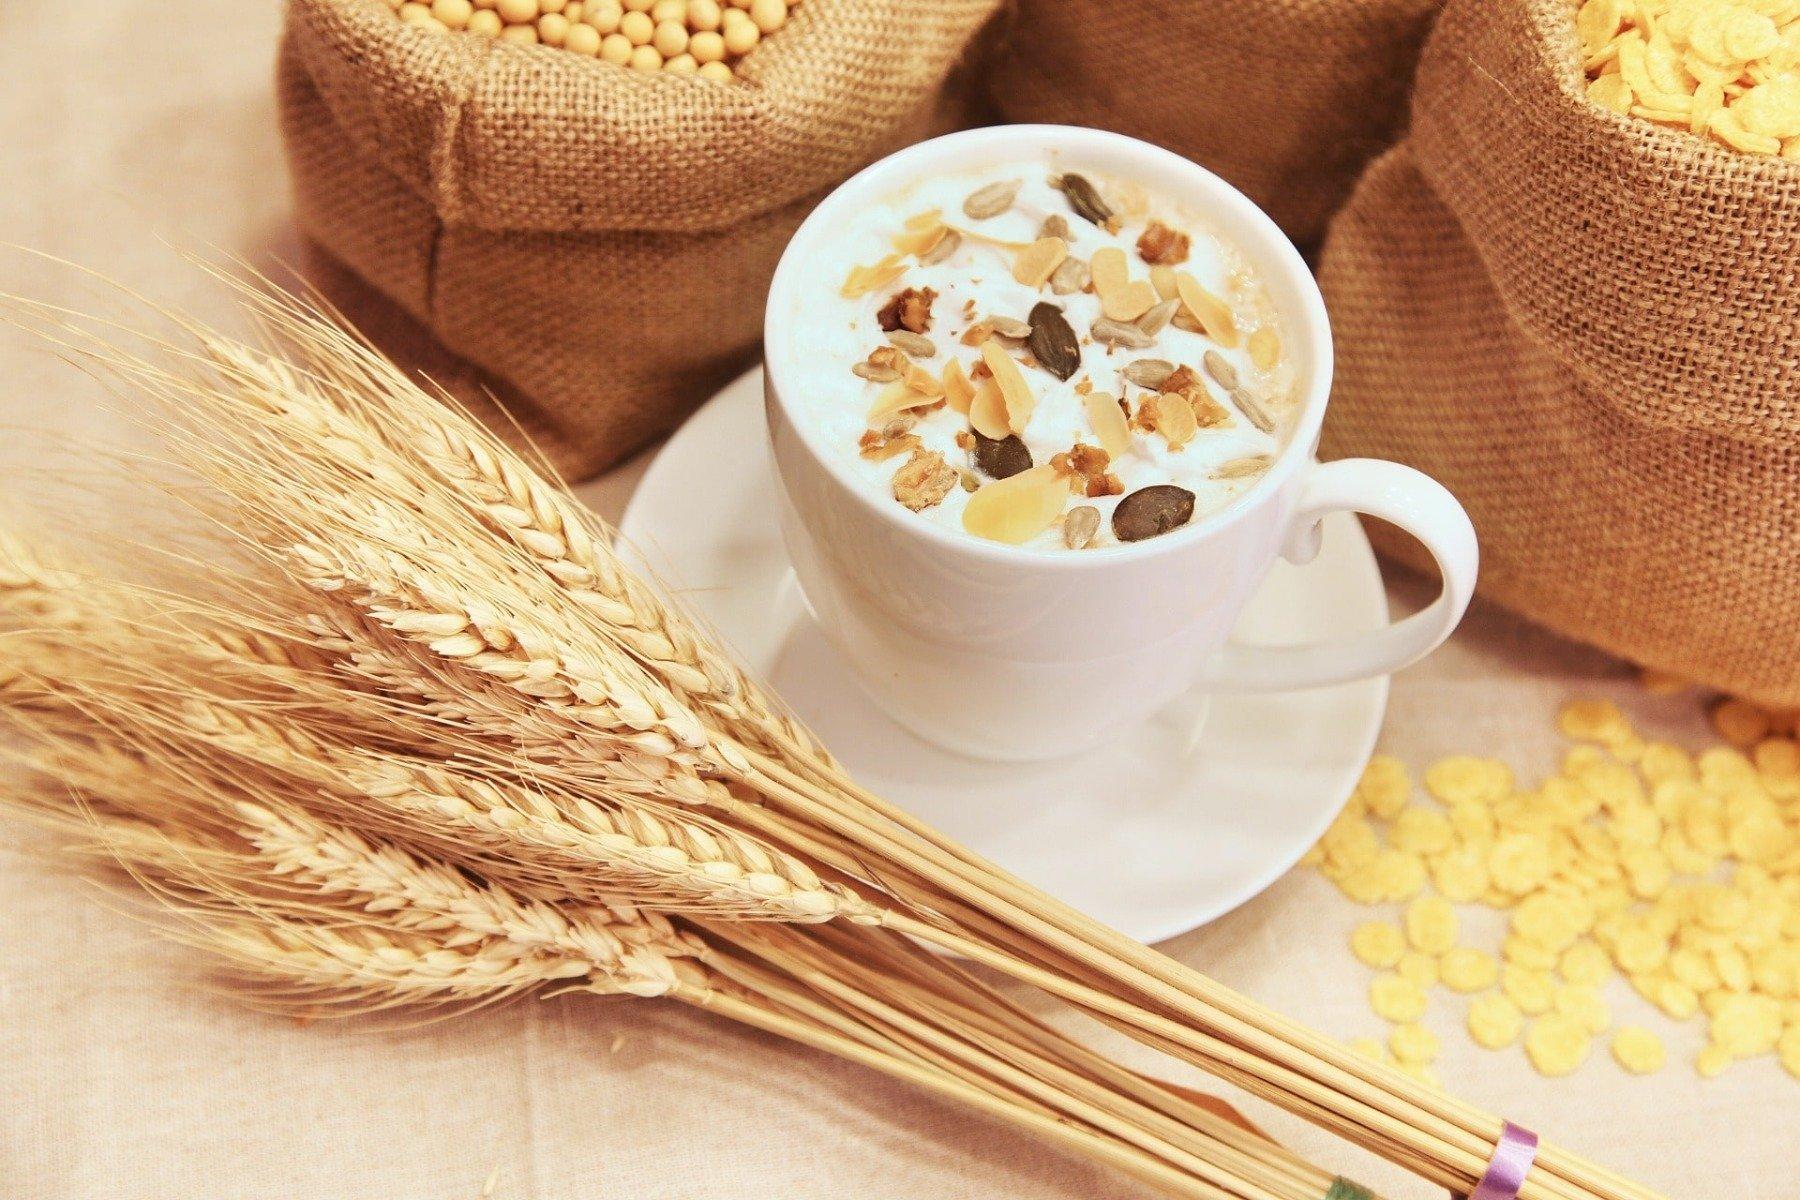 Gluten-free flours - oat flour